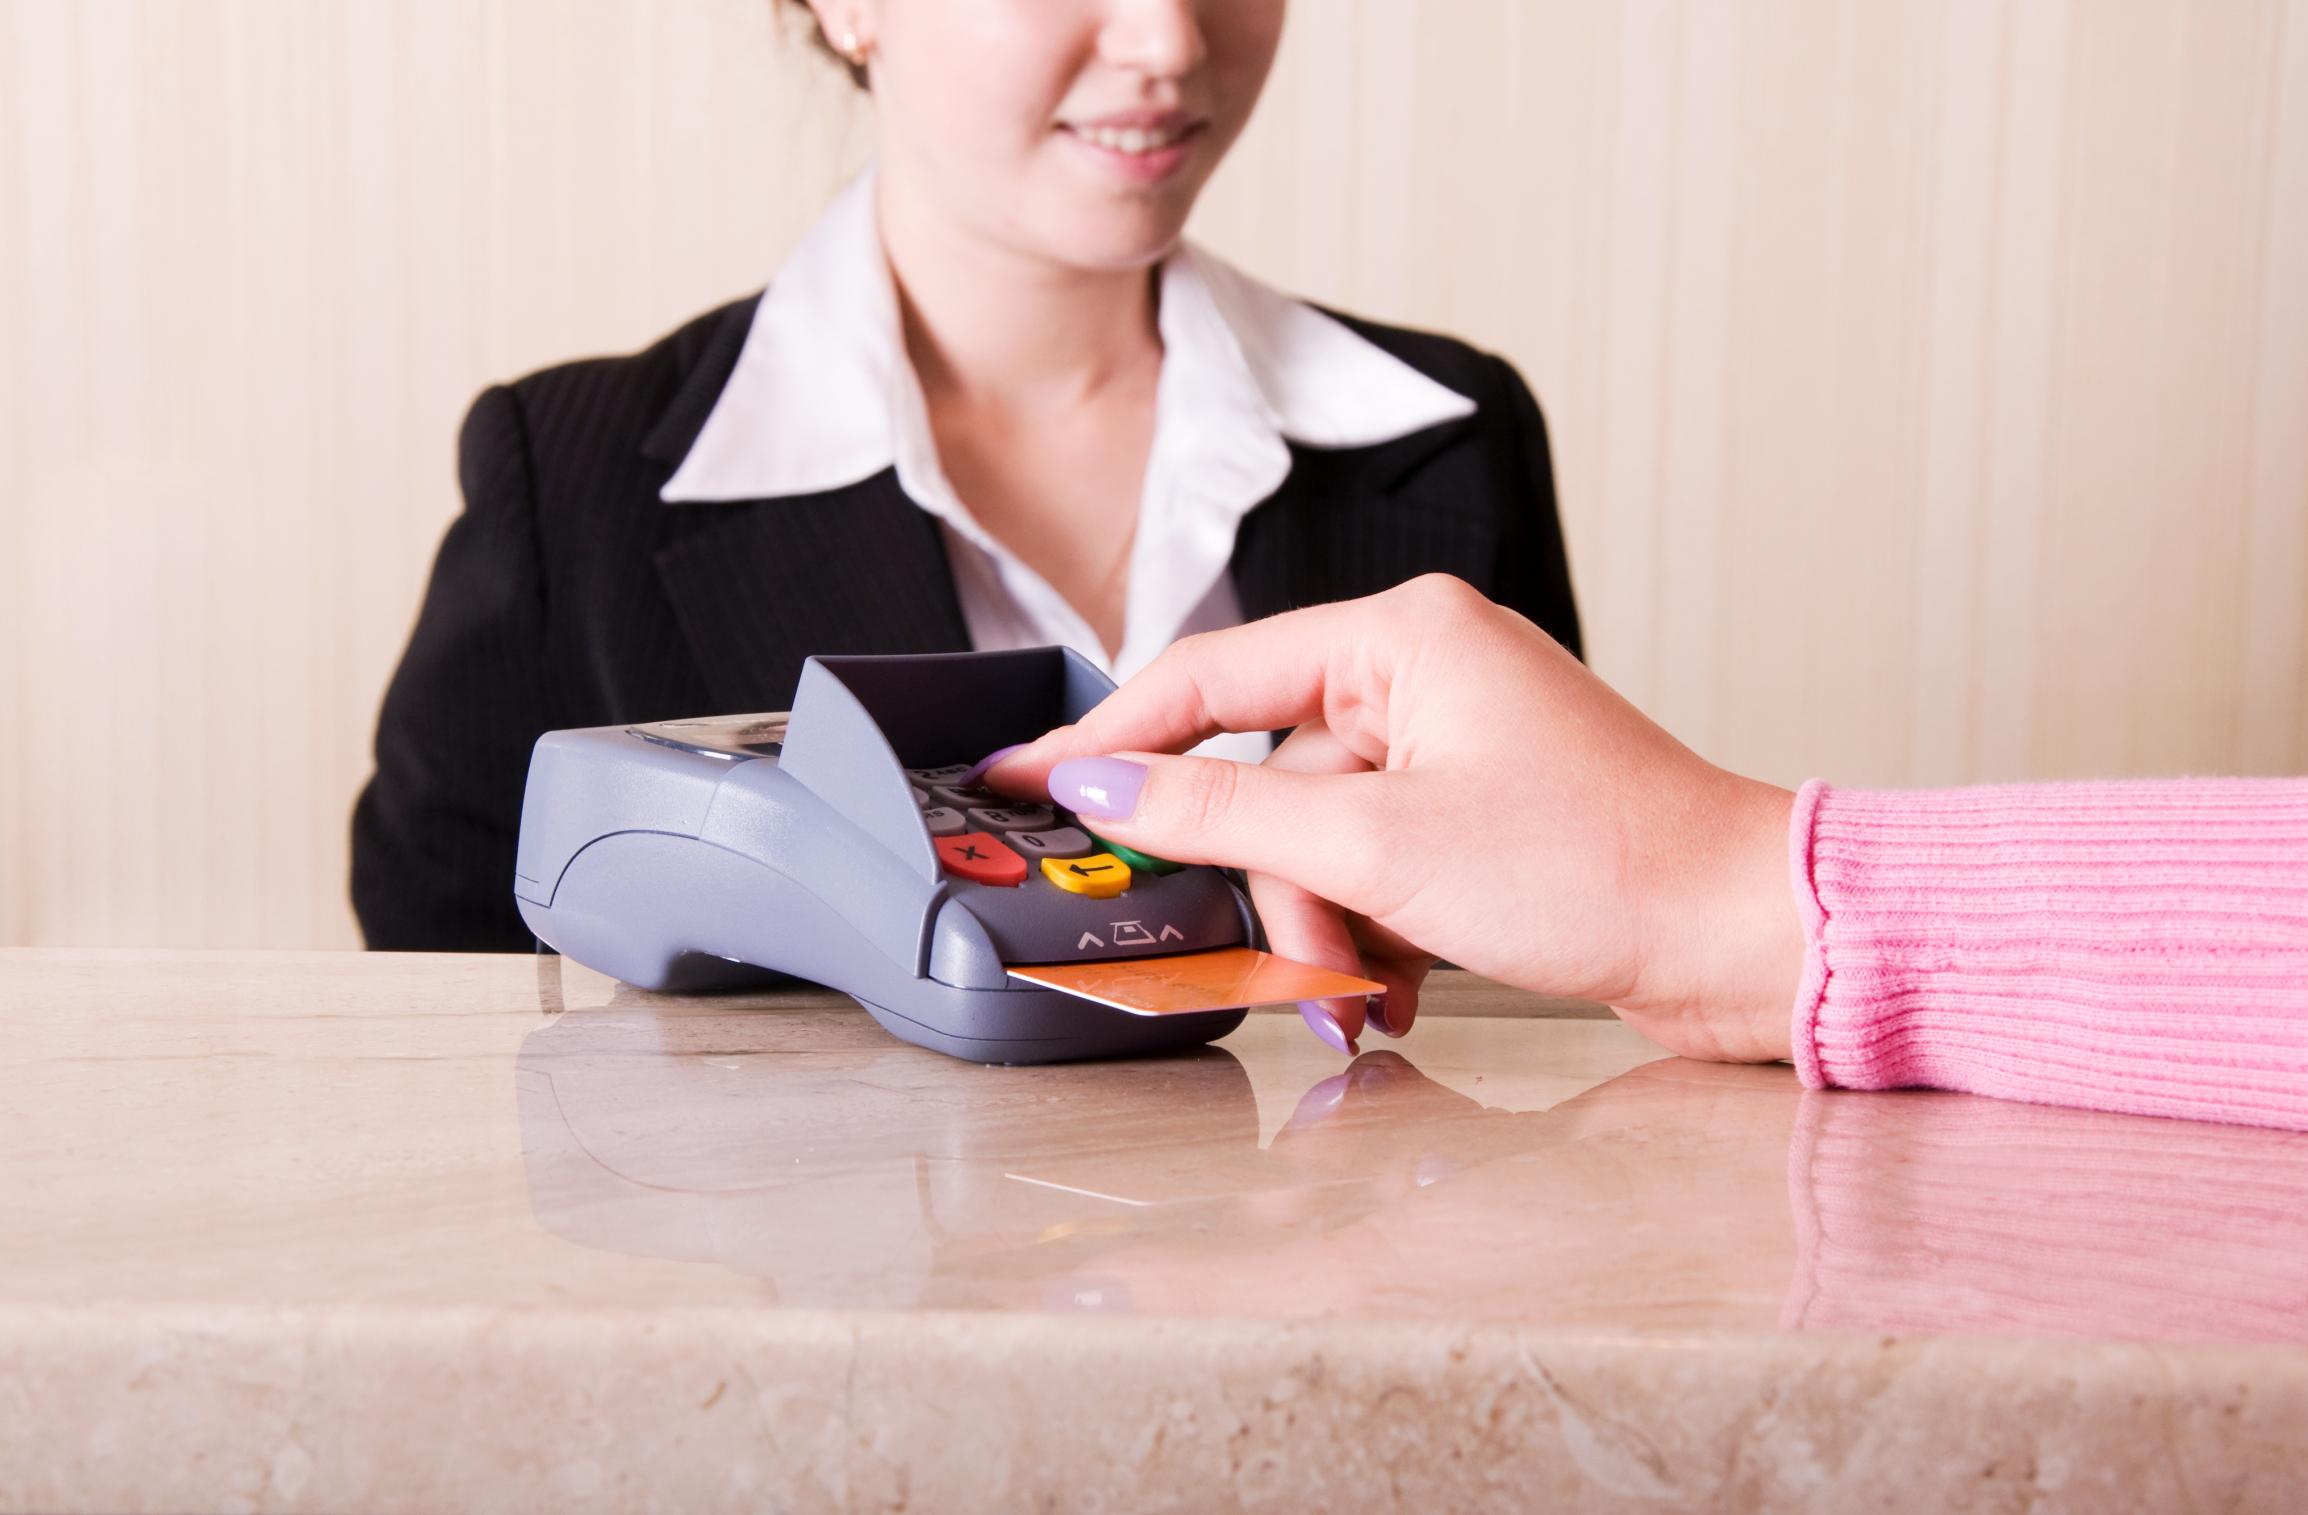 how to get a job at cvs cashier